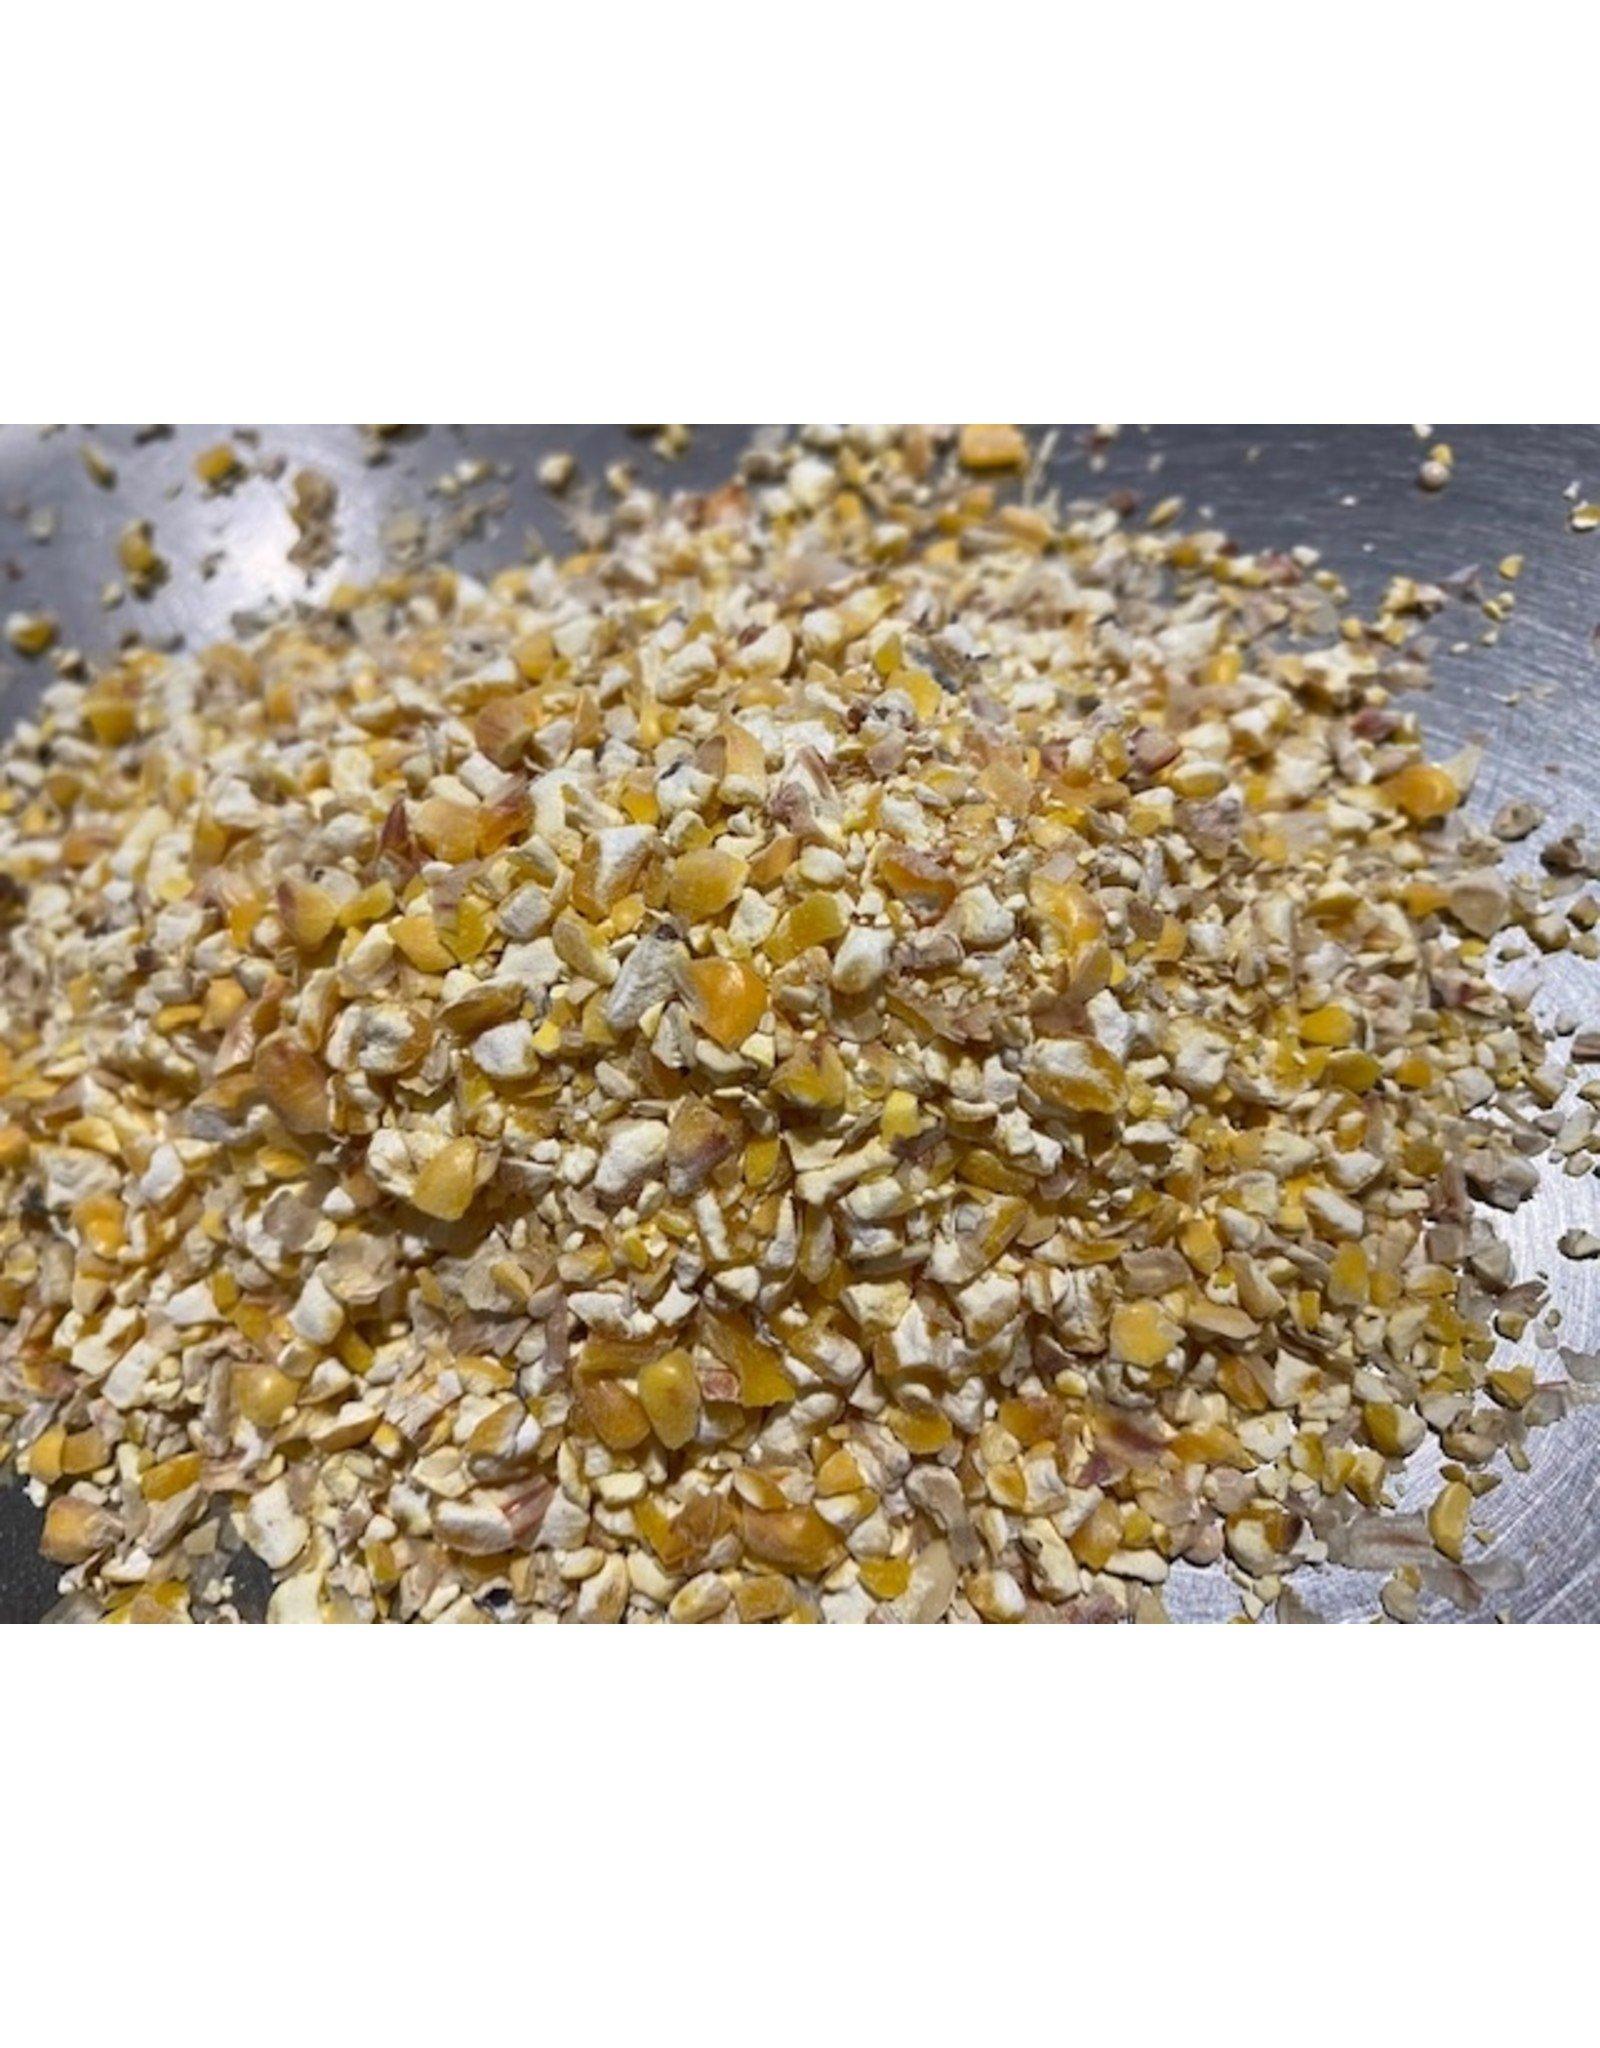 Mill Creek/Seed CORN18KG recleaned 39.6LB Bag of Corn